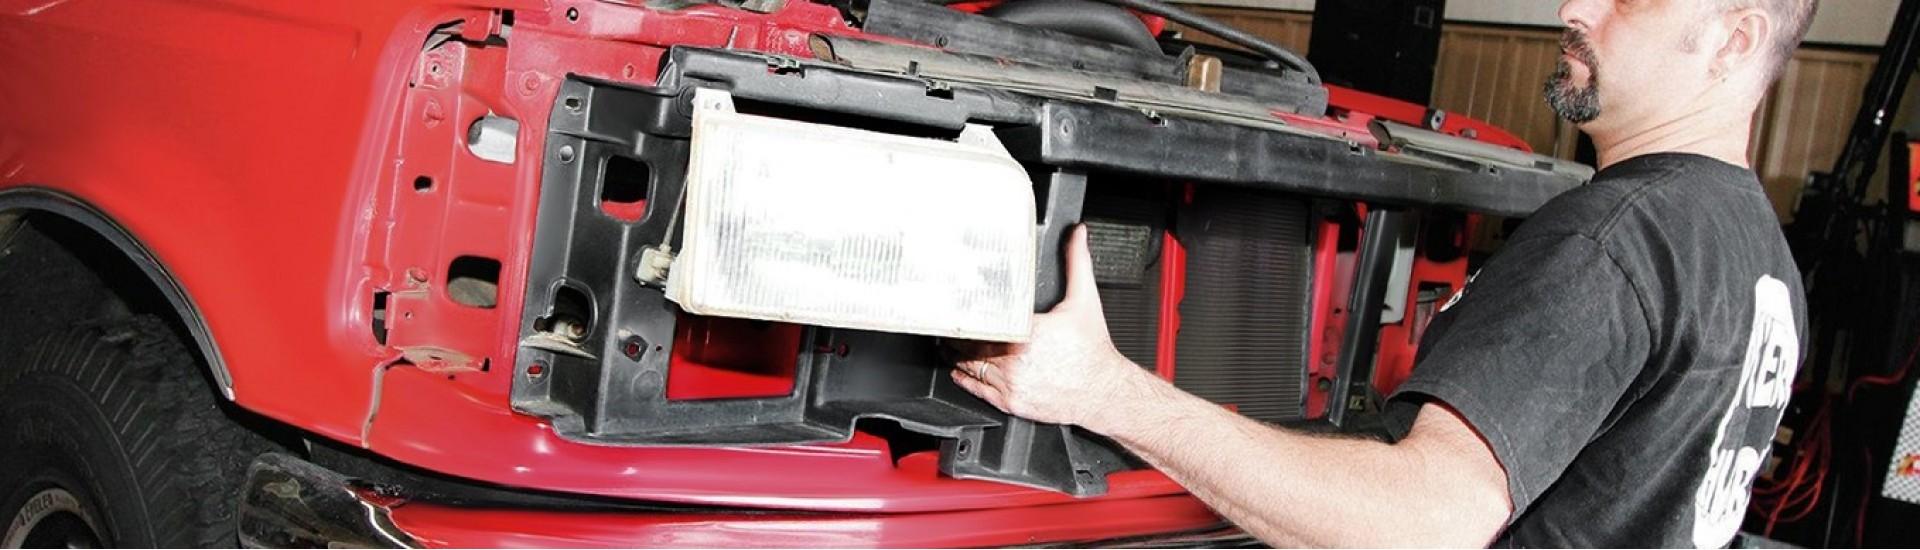 سینی جلو ، قیمت سینی جلو ، replacement header panels